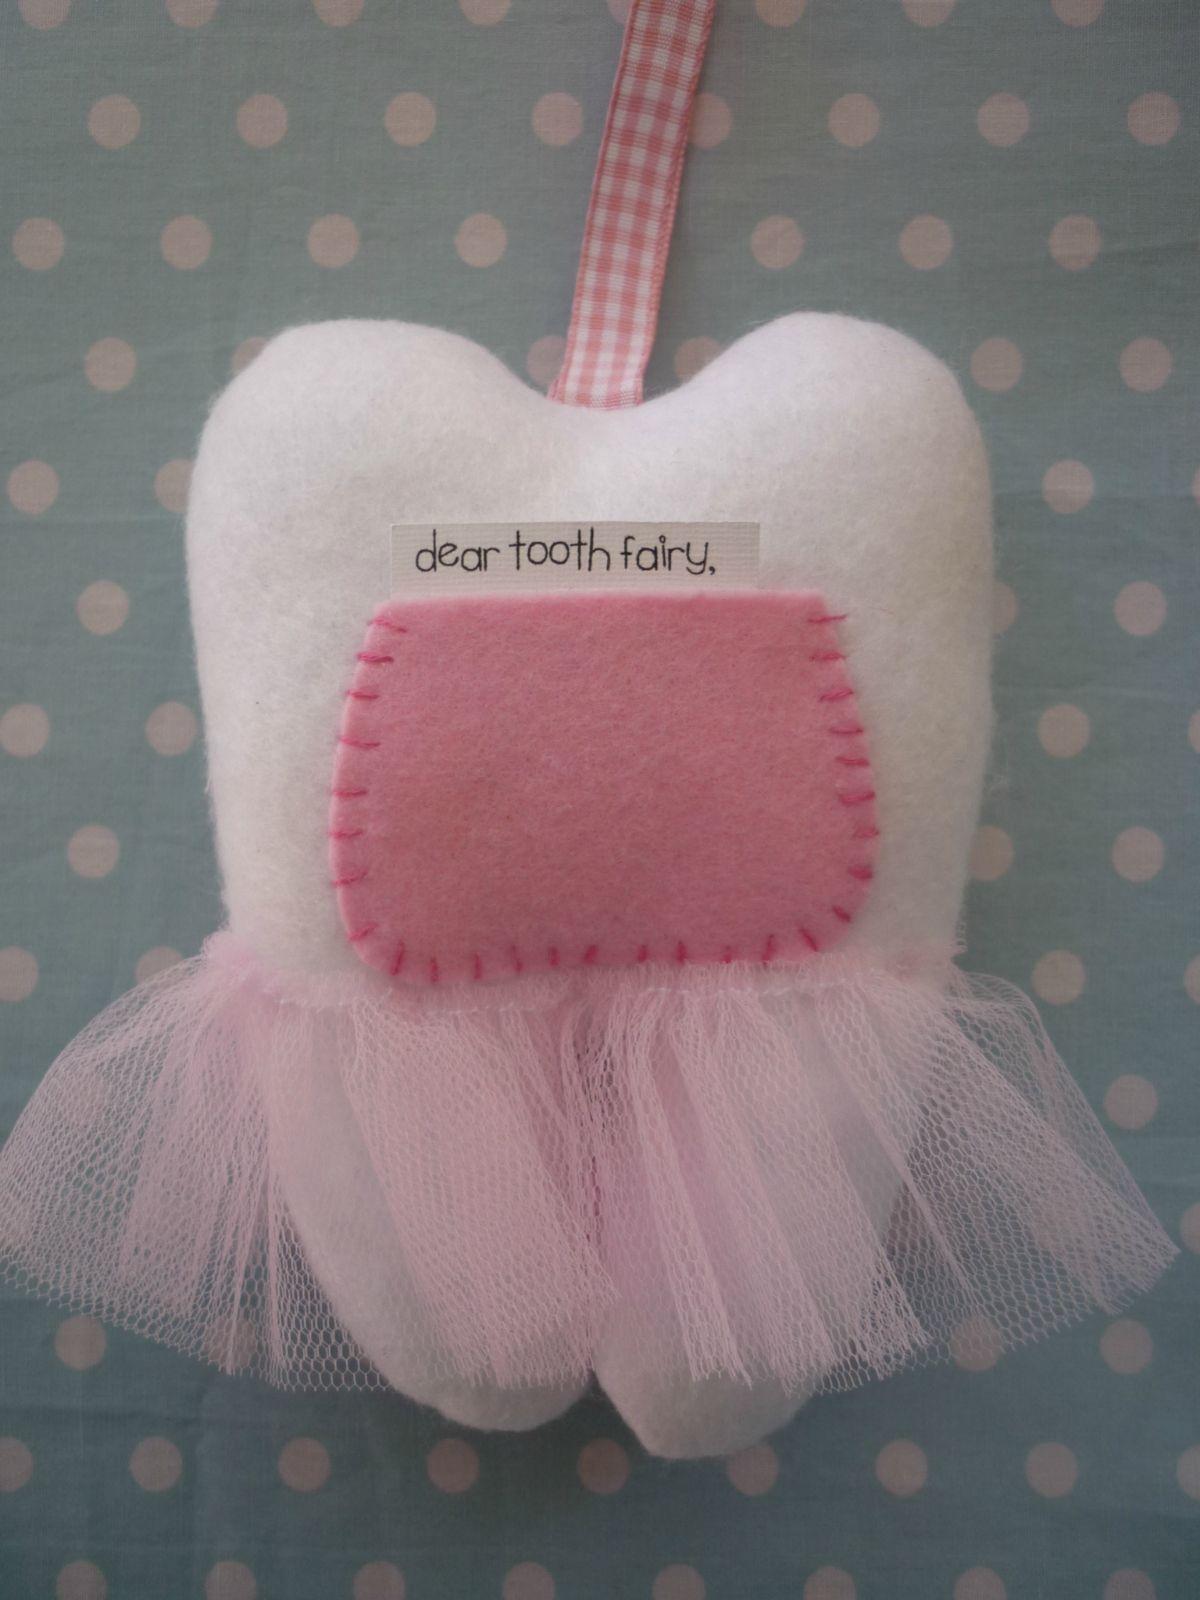 Bella The Ballerina Tooth Fairy Pillow #toothfairyideas